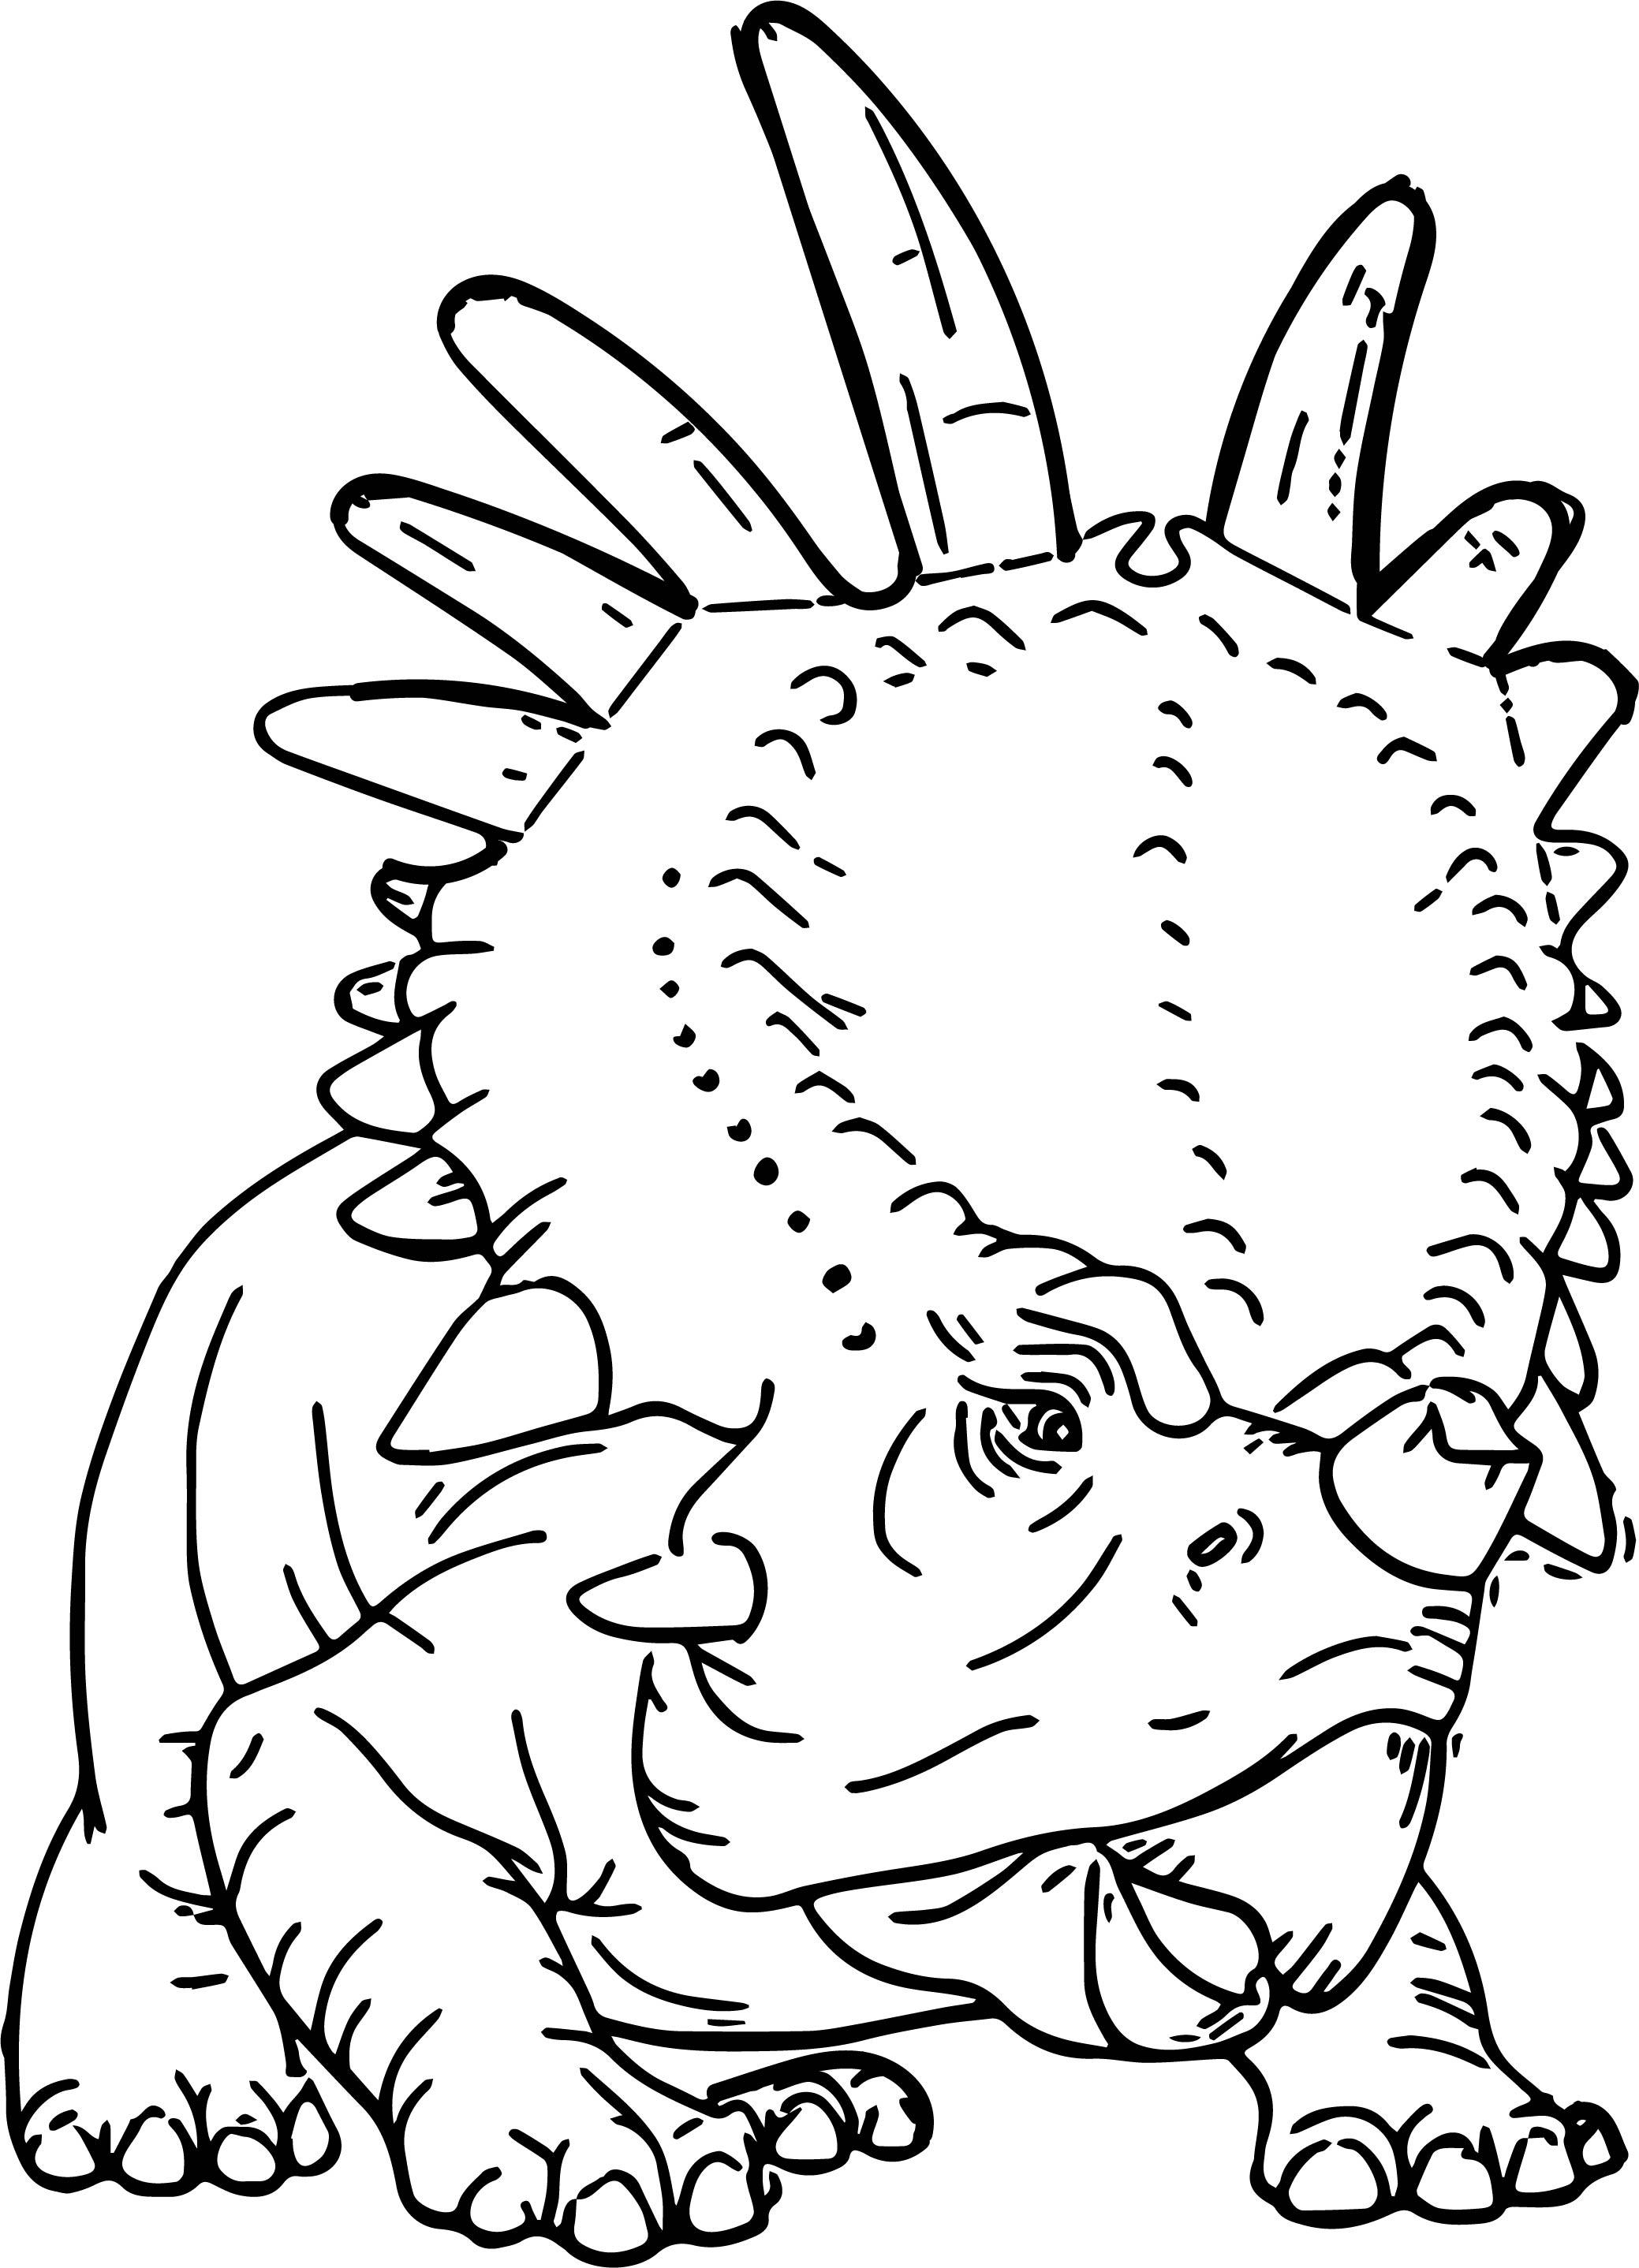 disney dinosaur coloring pages | New Bayl Disney Dinosaur Coloring Page | Wecoloringpage.com